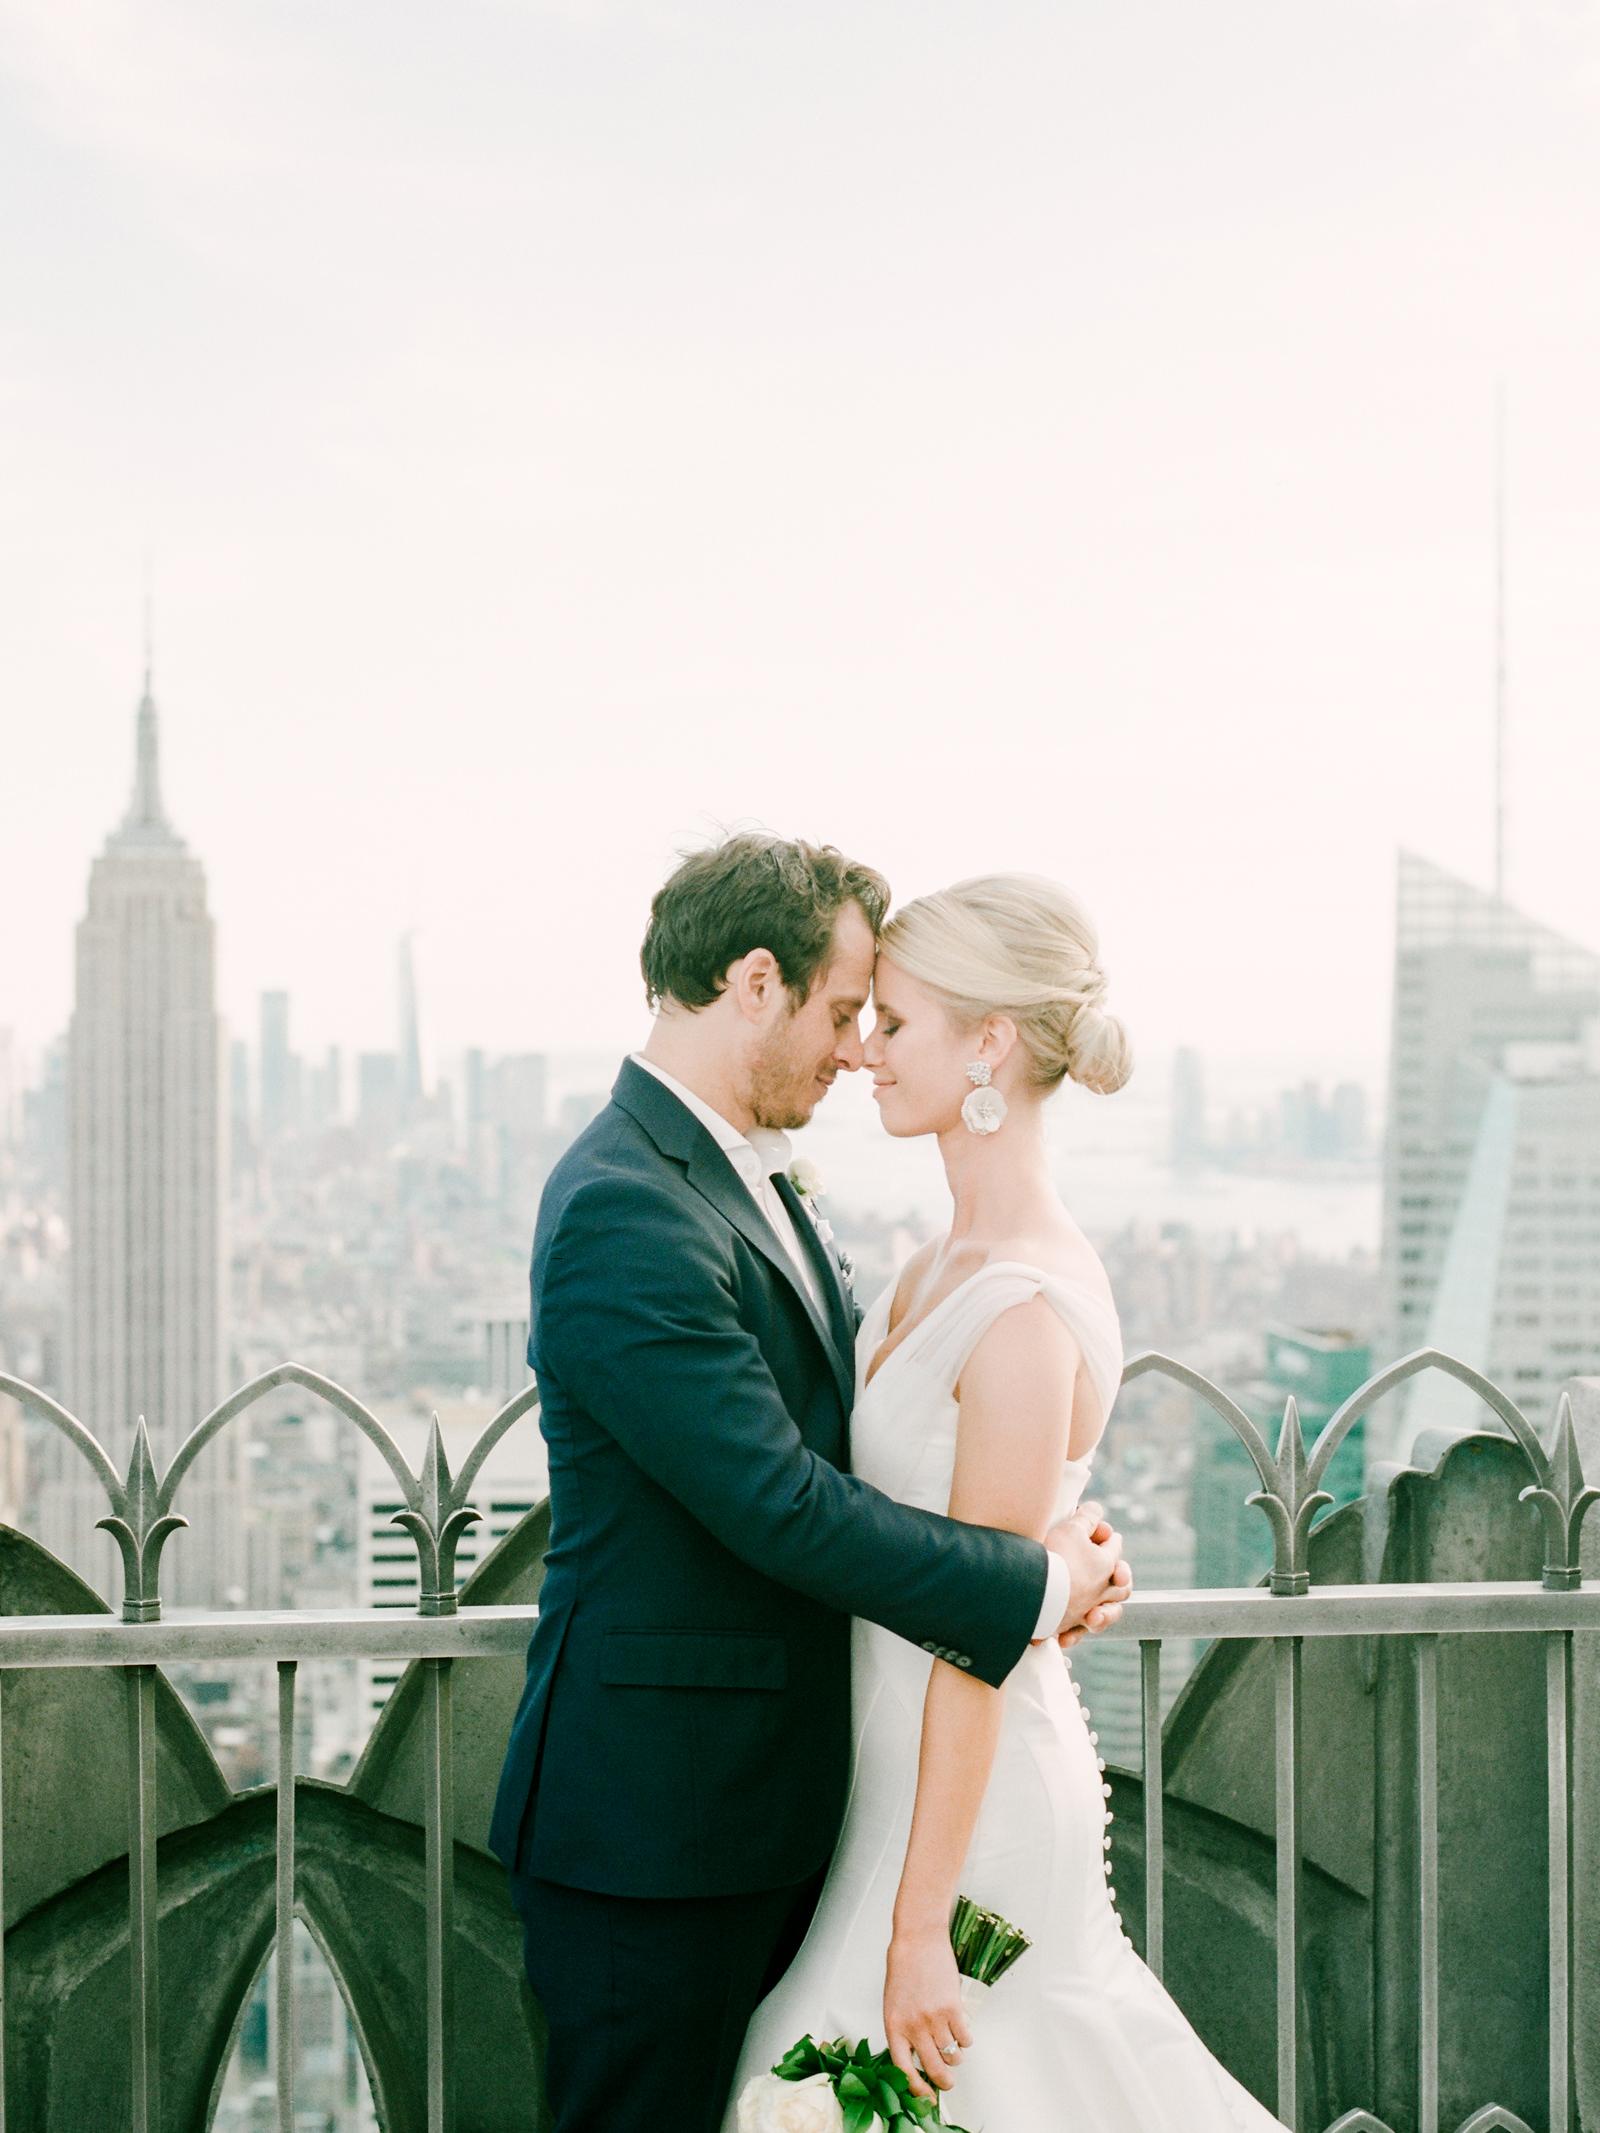 Intimate-NYC_wedding_ by Tanya Isaeva-154.jpg